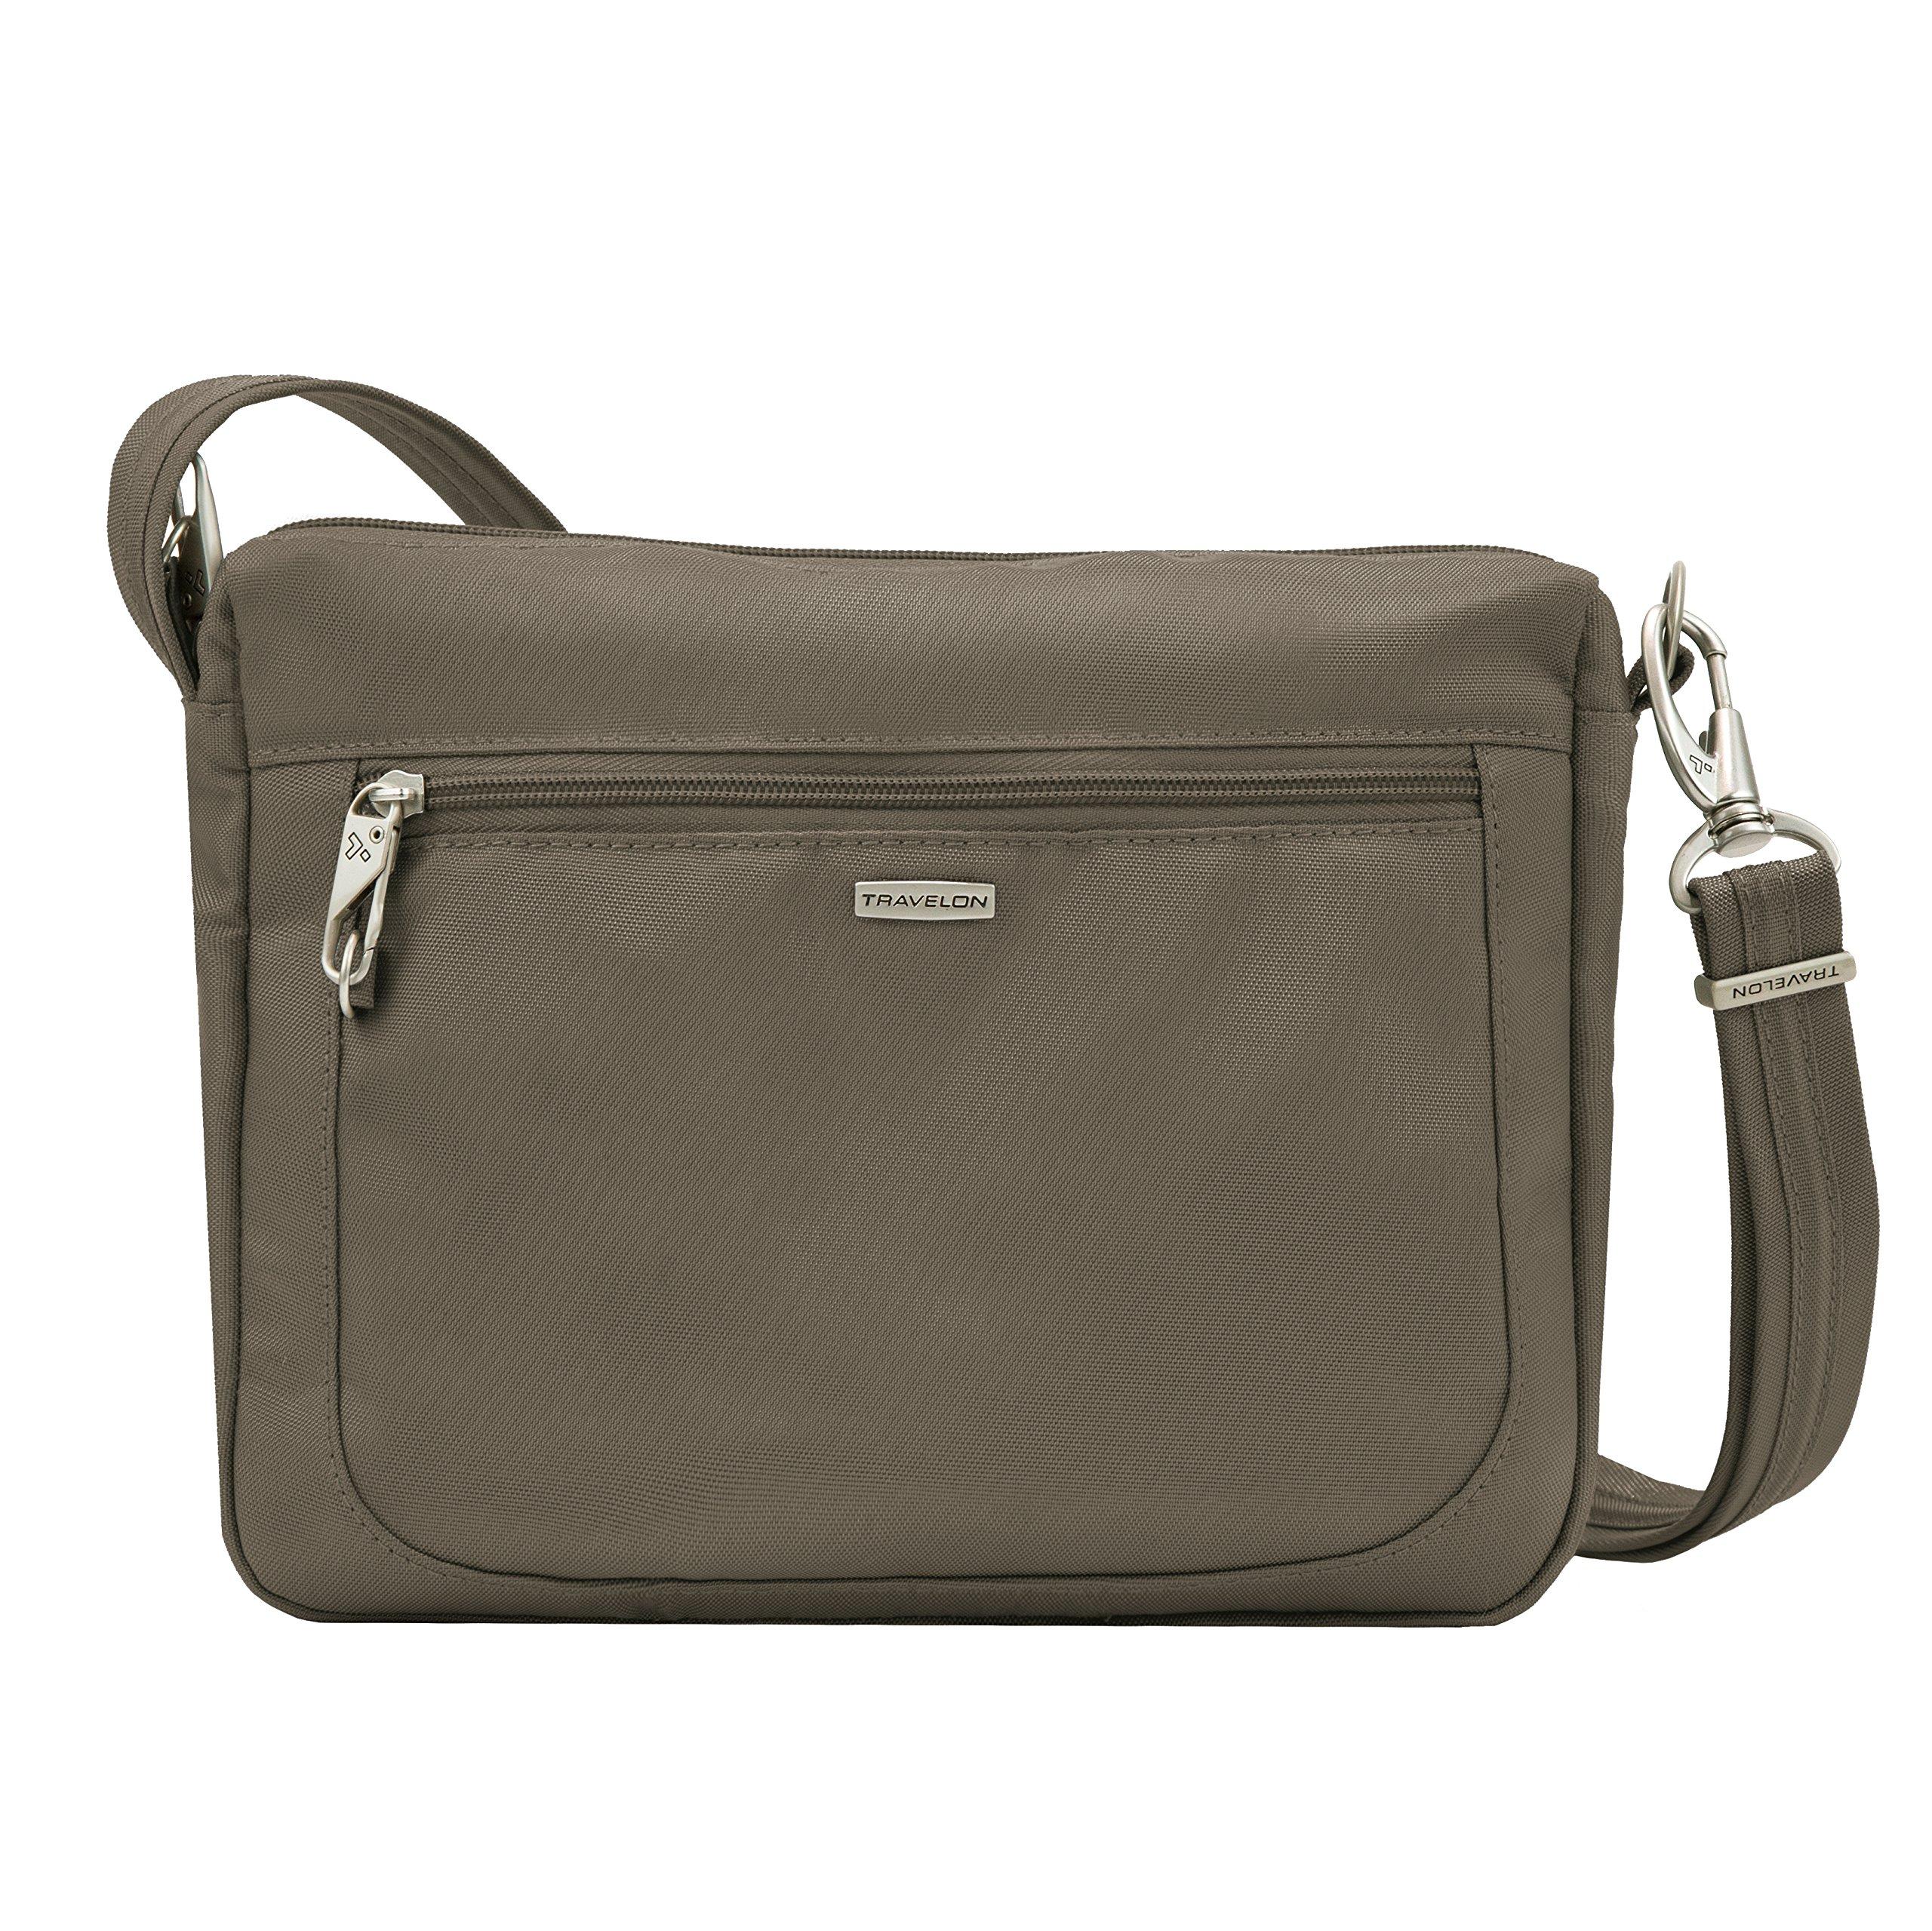 Travelon Anti-theft Classic Small E/W Cross Body Bag, Nutmeg